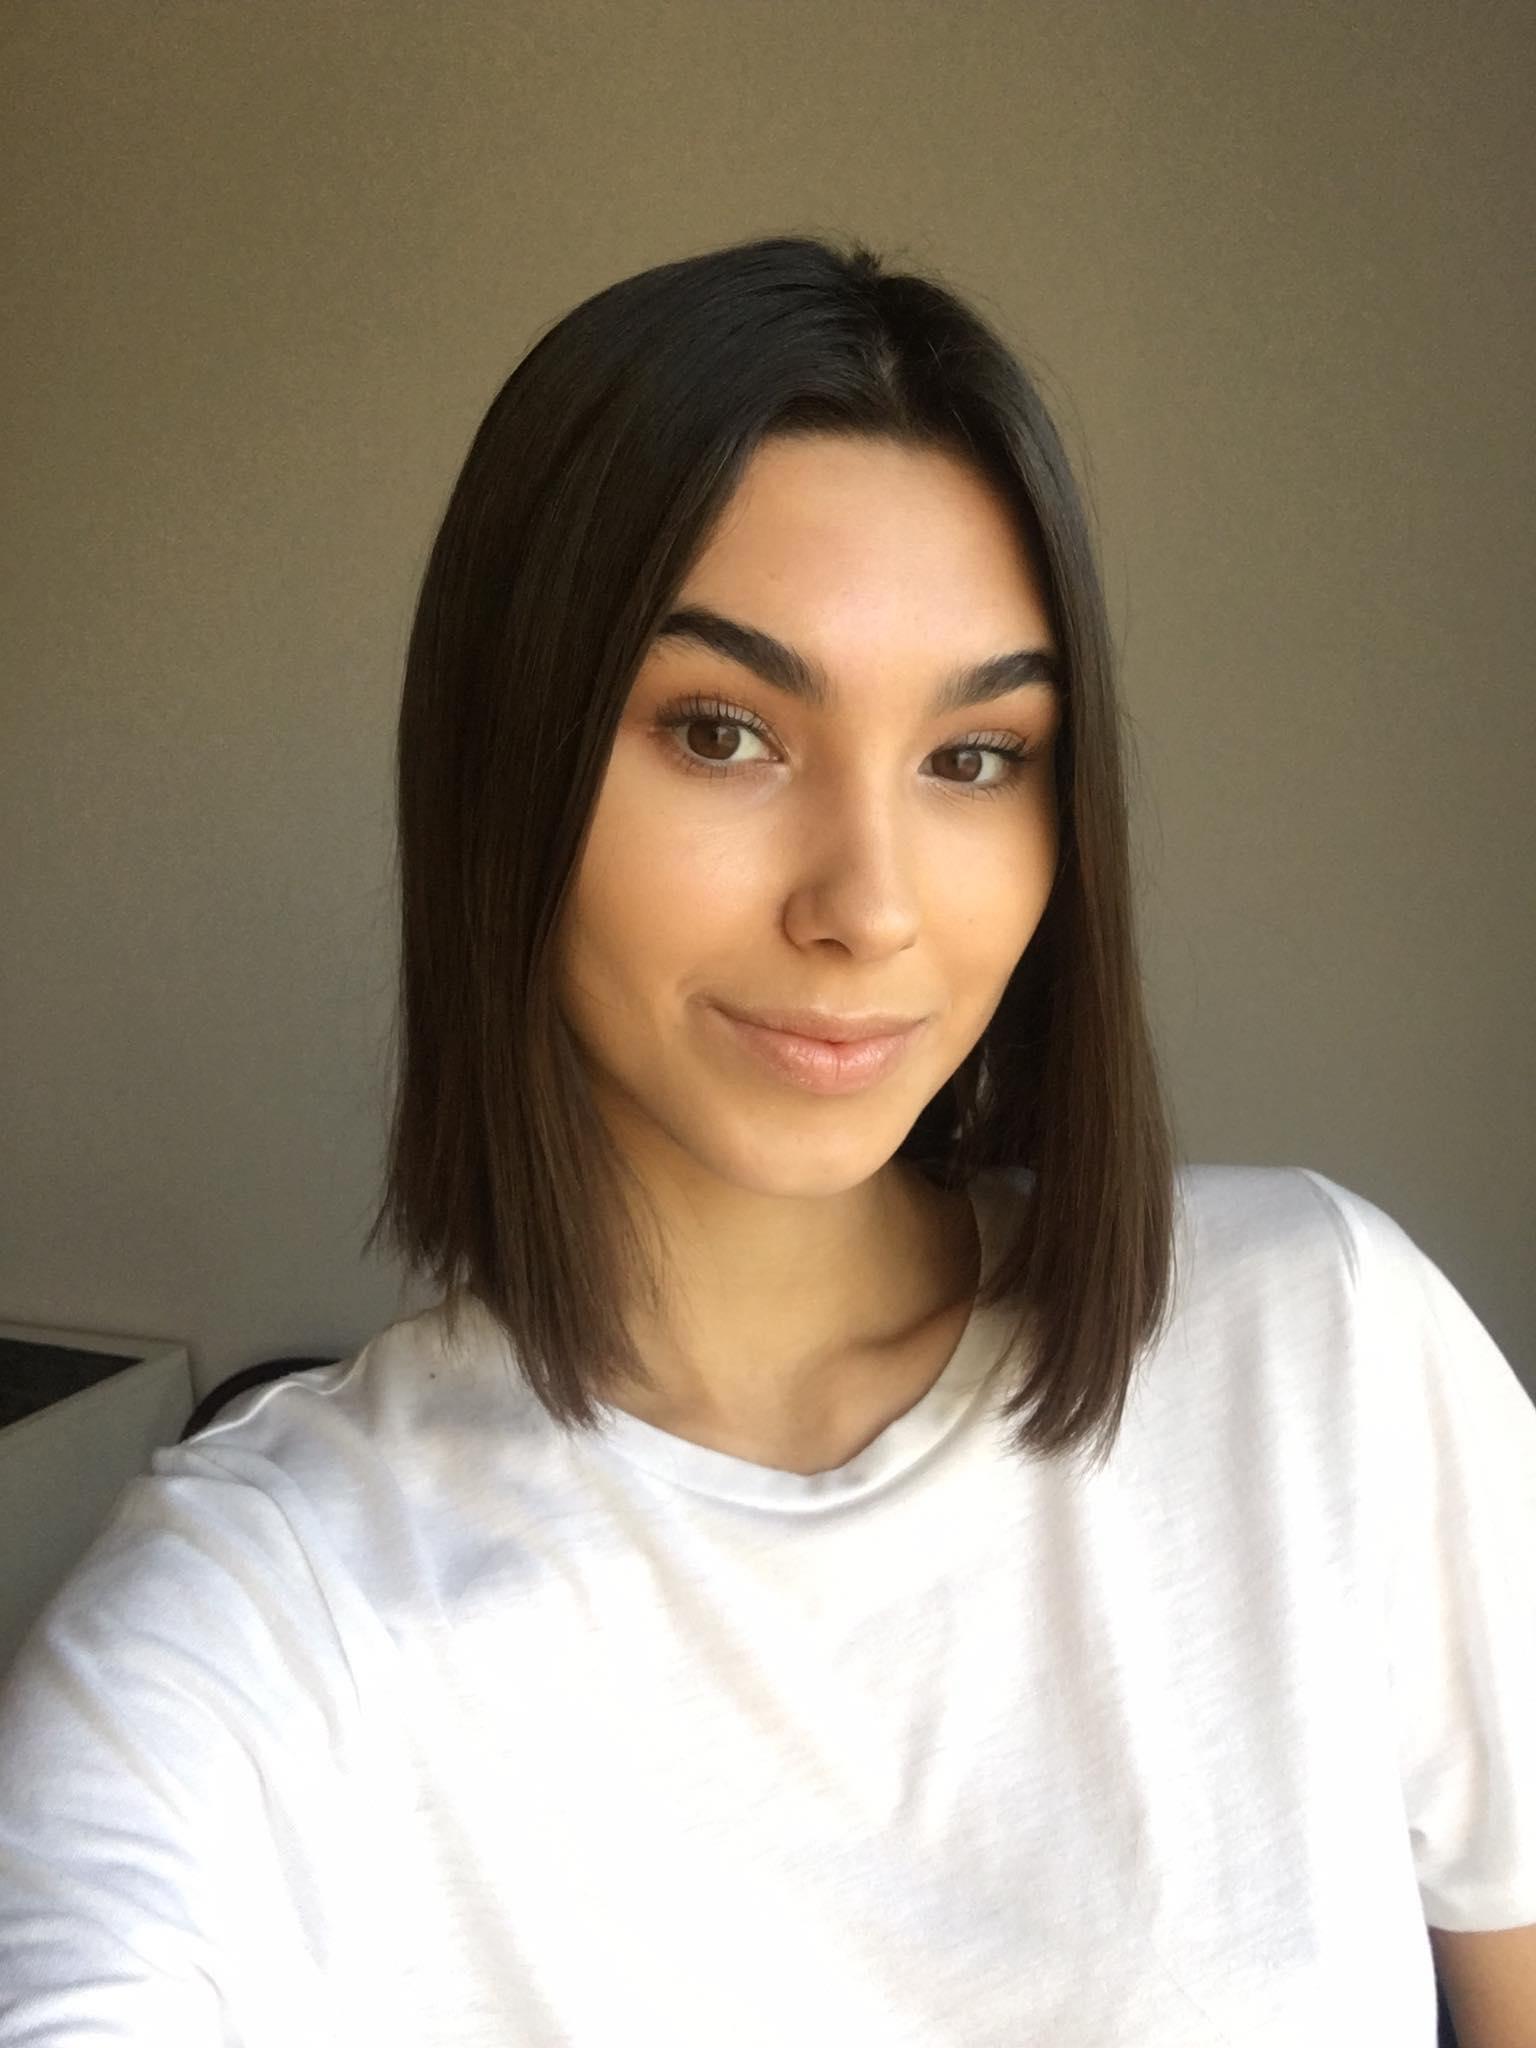 julia sobańska